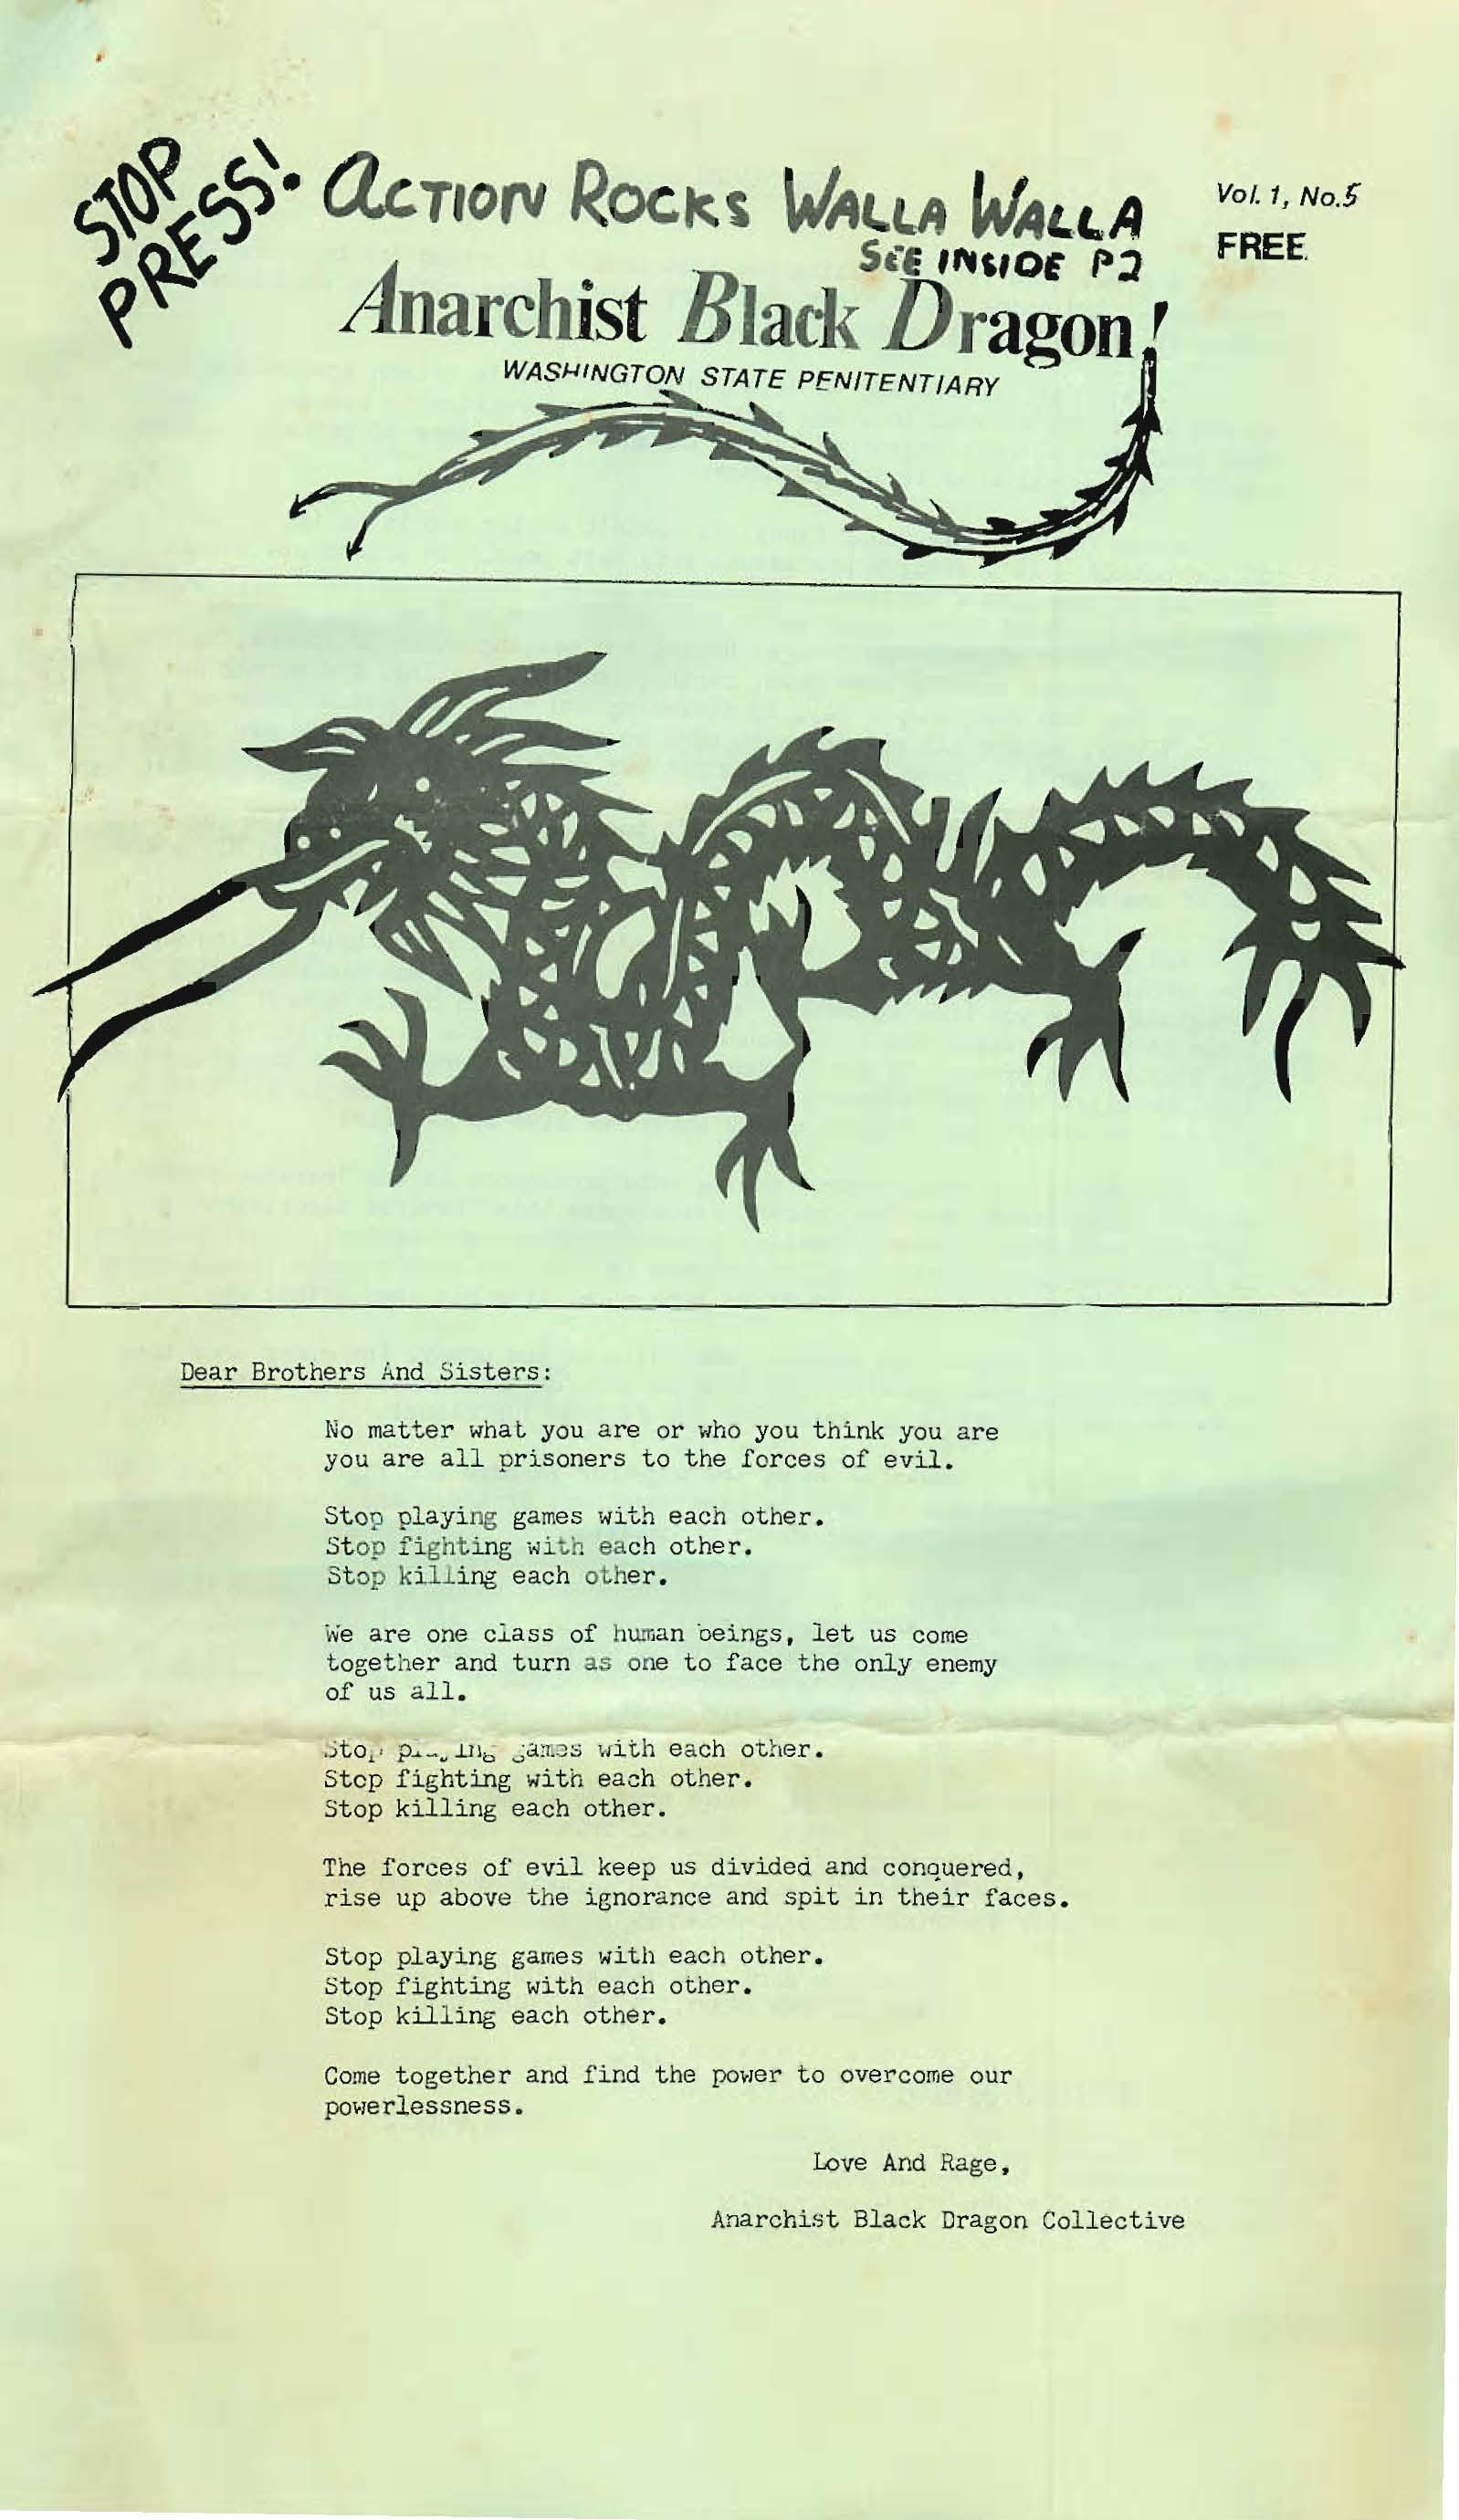 Anarchist Black Dragon Periodical